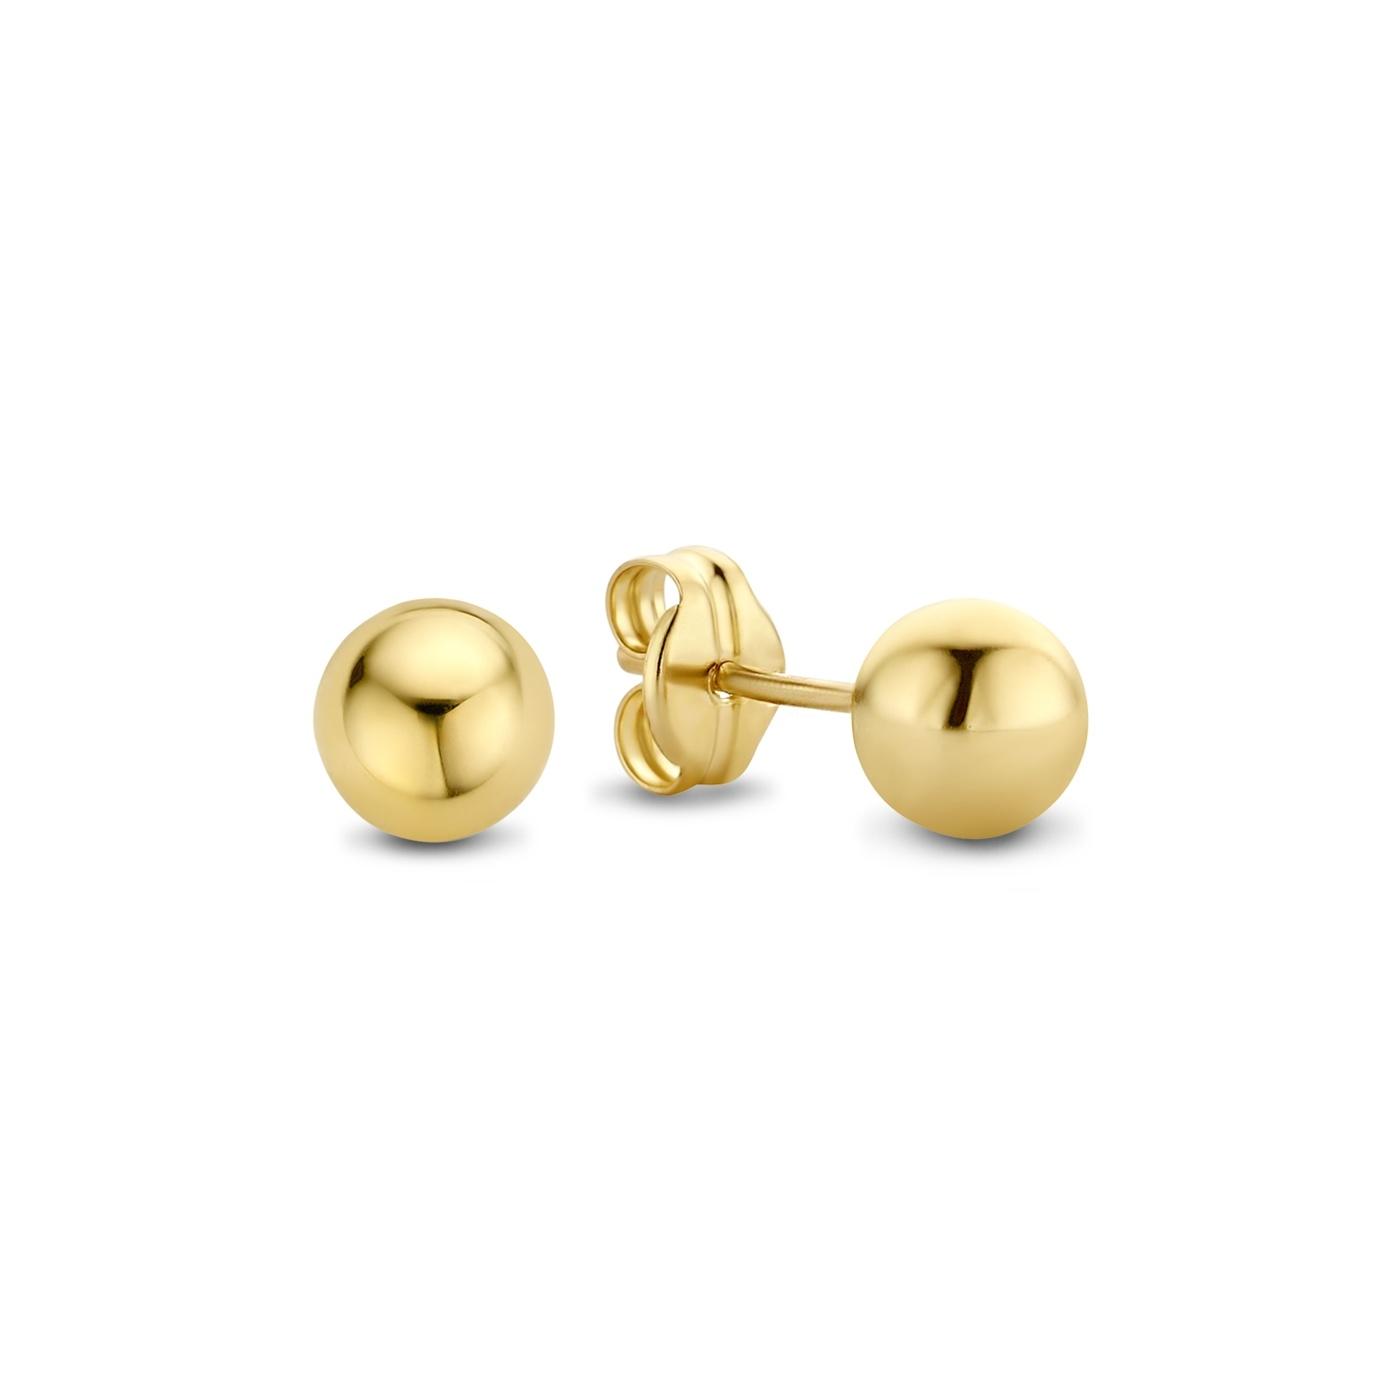 Isabel Bernard Rivoli Coco 14 carat gold ear studs bead